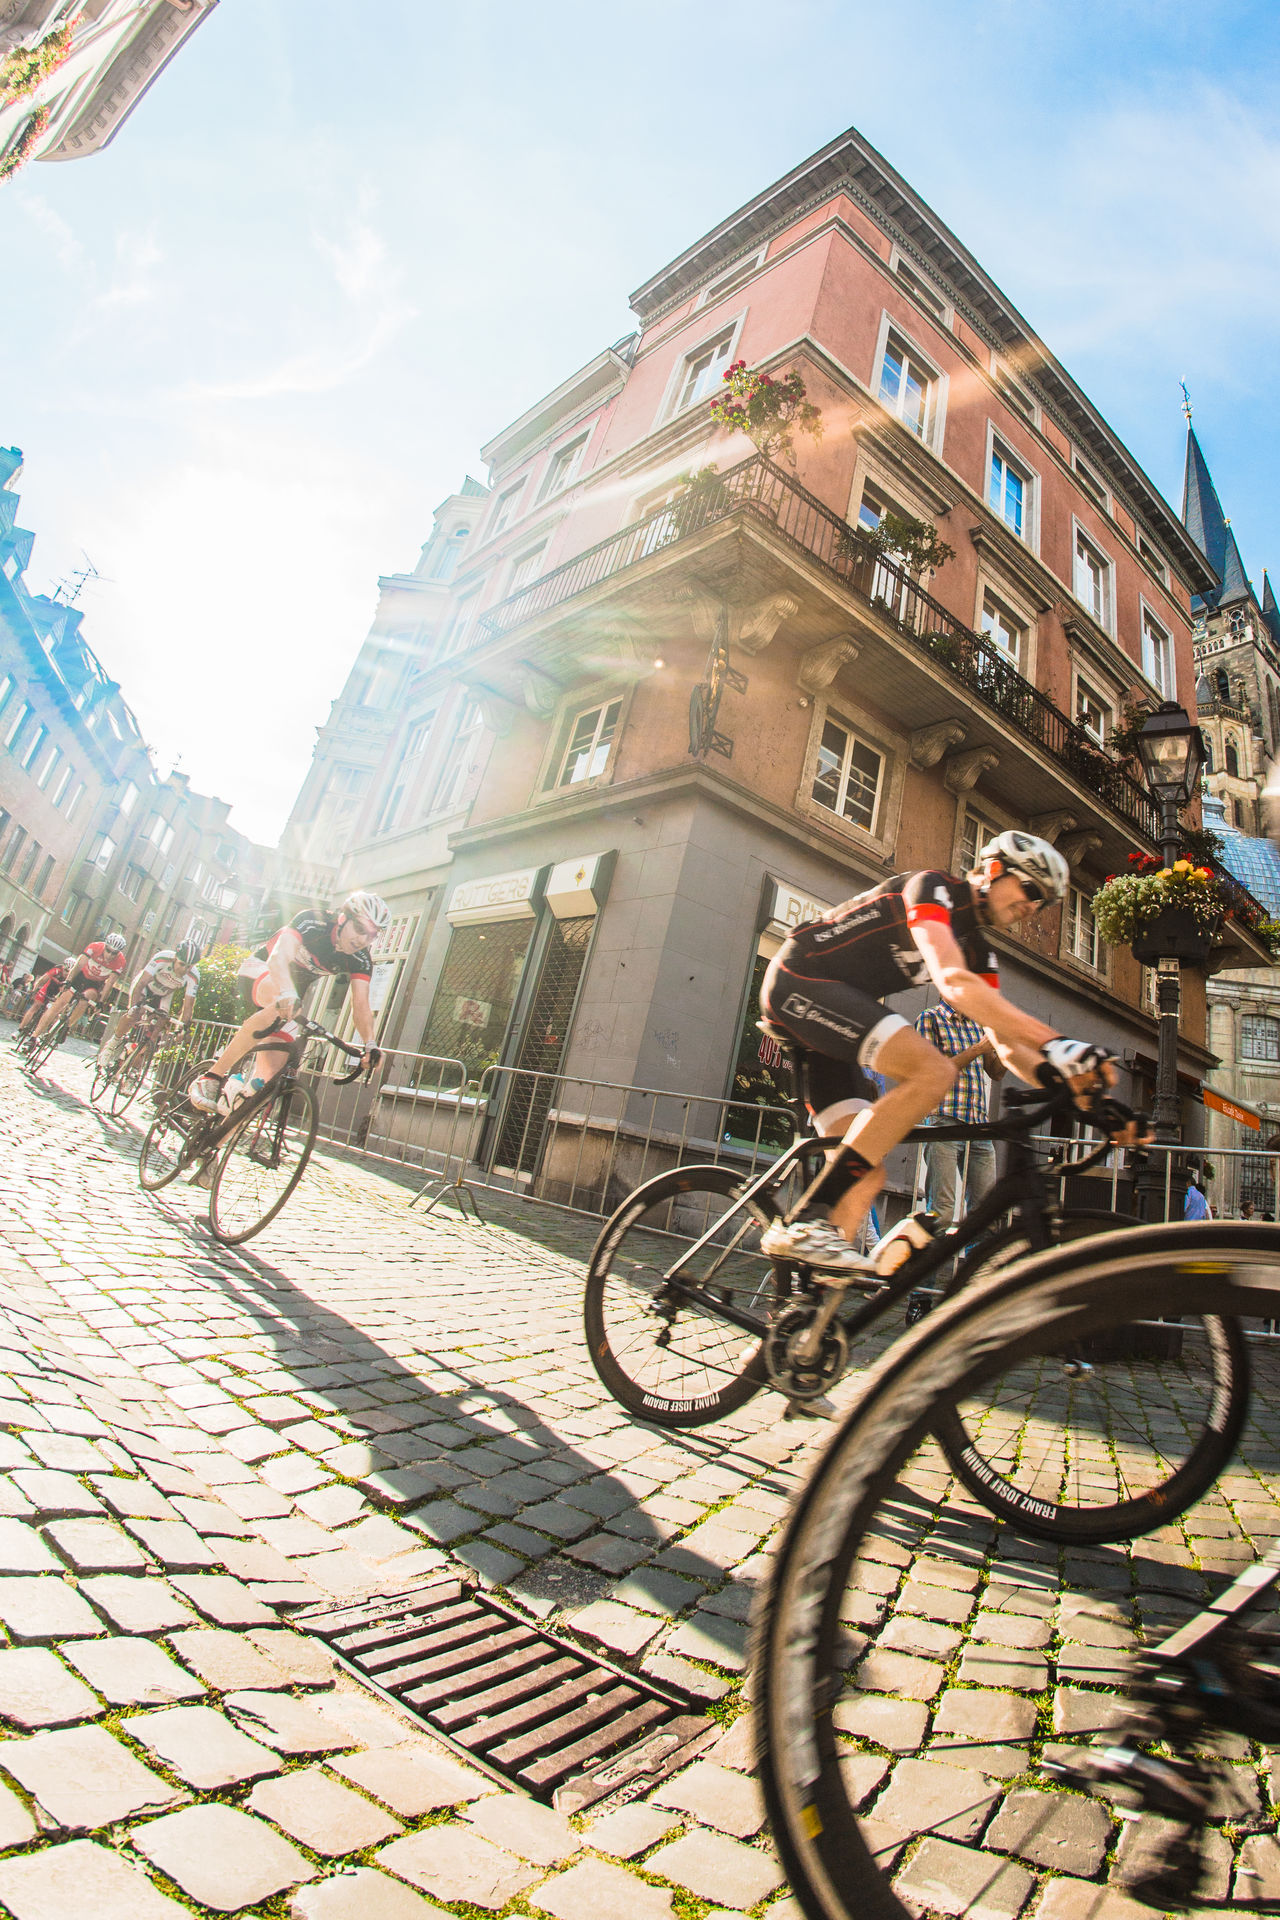 Aachen bike rally captured with a fisheye Lense. ✌🏻️ Creative Light And Shadow